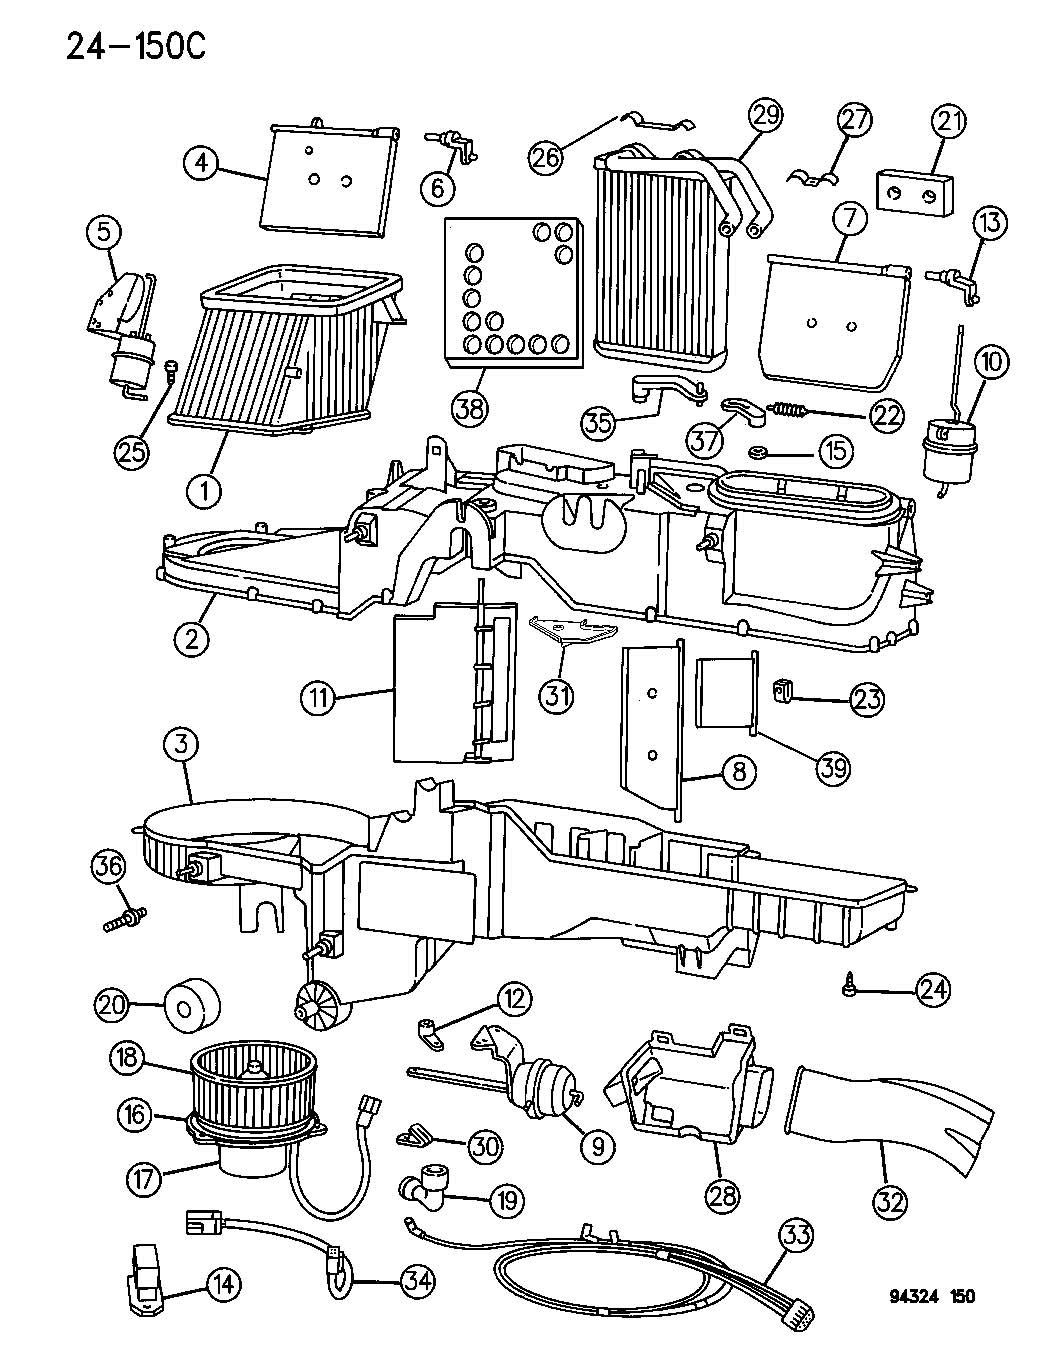 dodge ram 2500 actuator  heater  vent  defrost  ventdefrost  haahca  mobility  herear  dhc